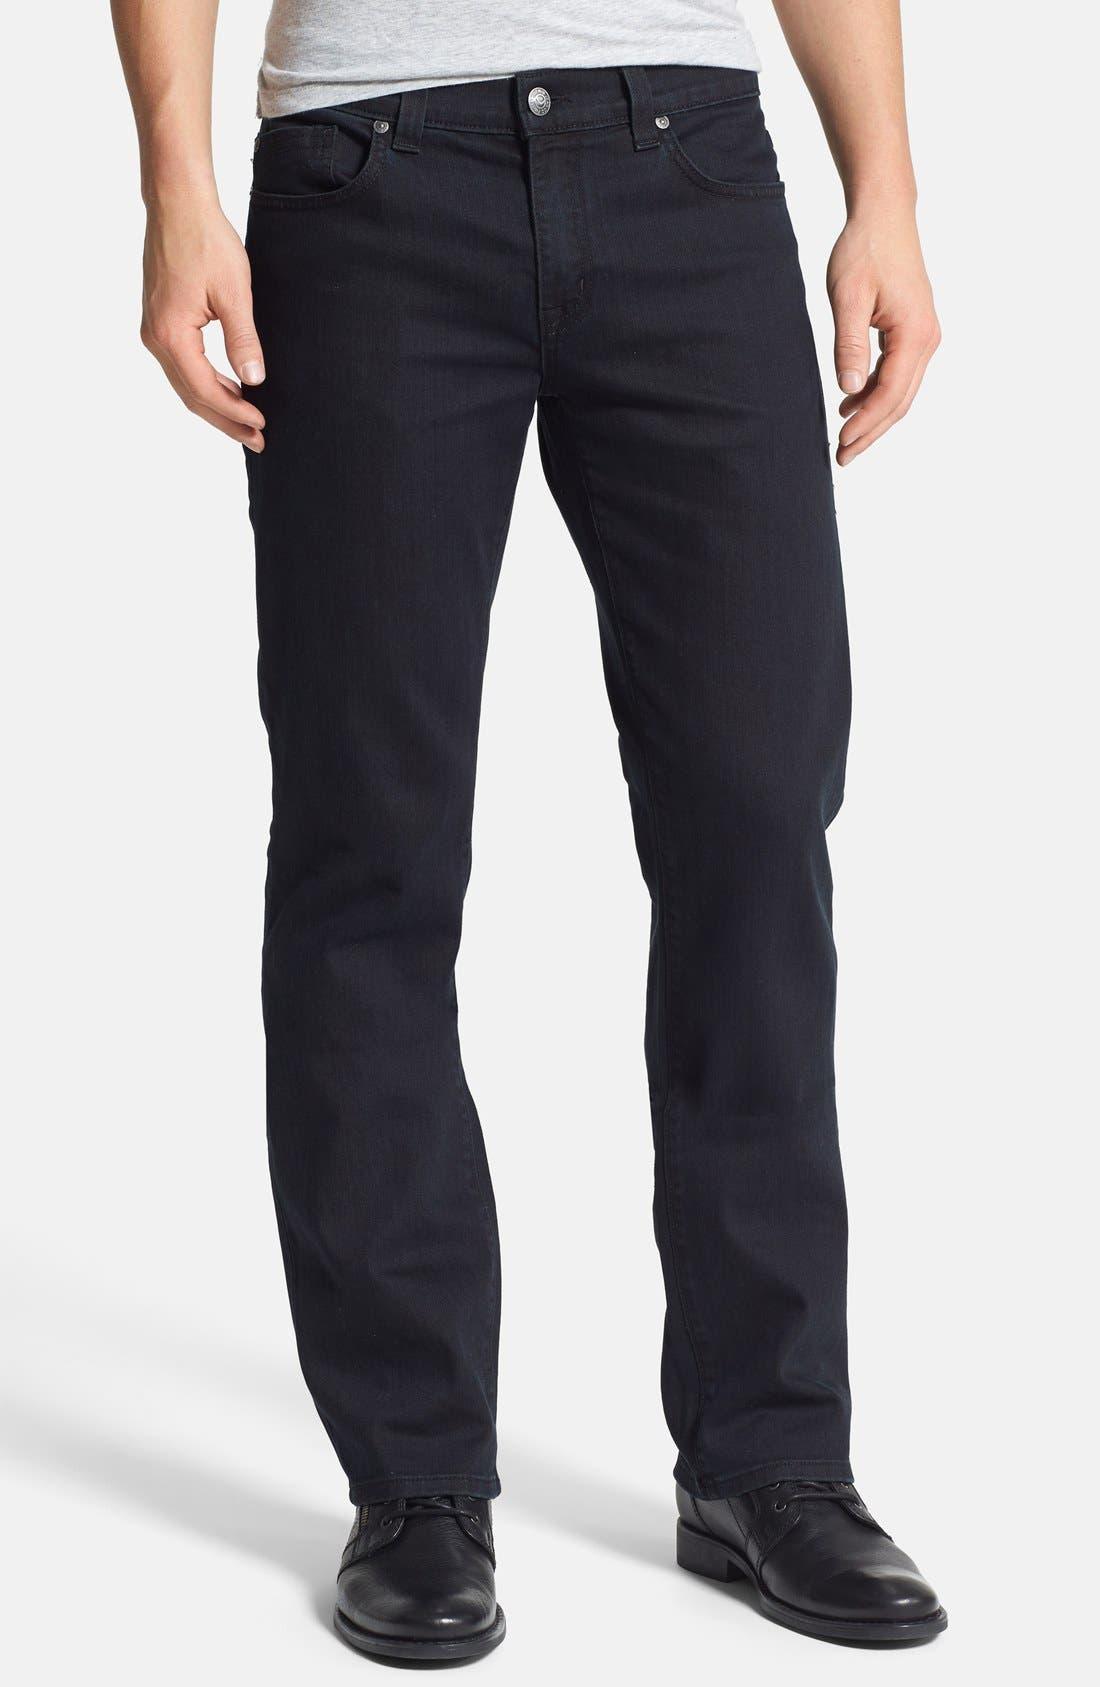 Alternate Image 1 Selected - Fidelity Denim '50-11' Straight Leg Jeans (Town Black Vintage)